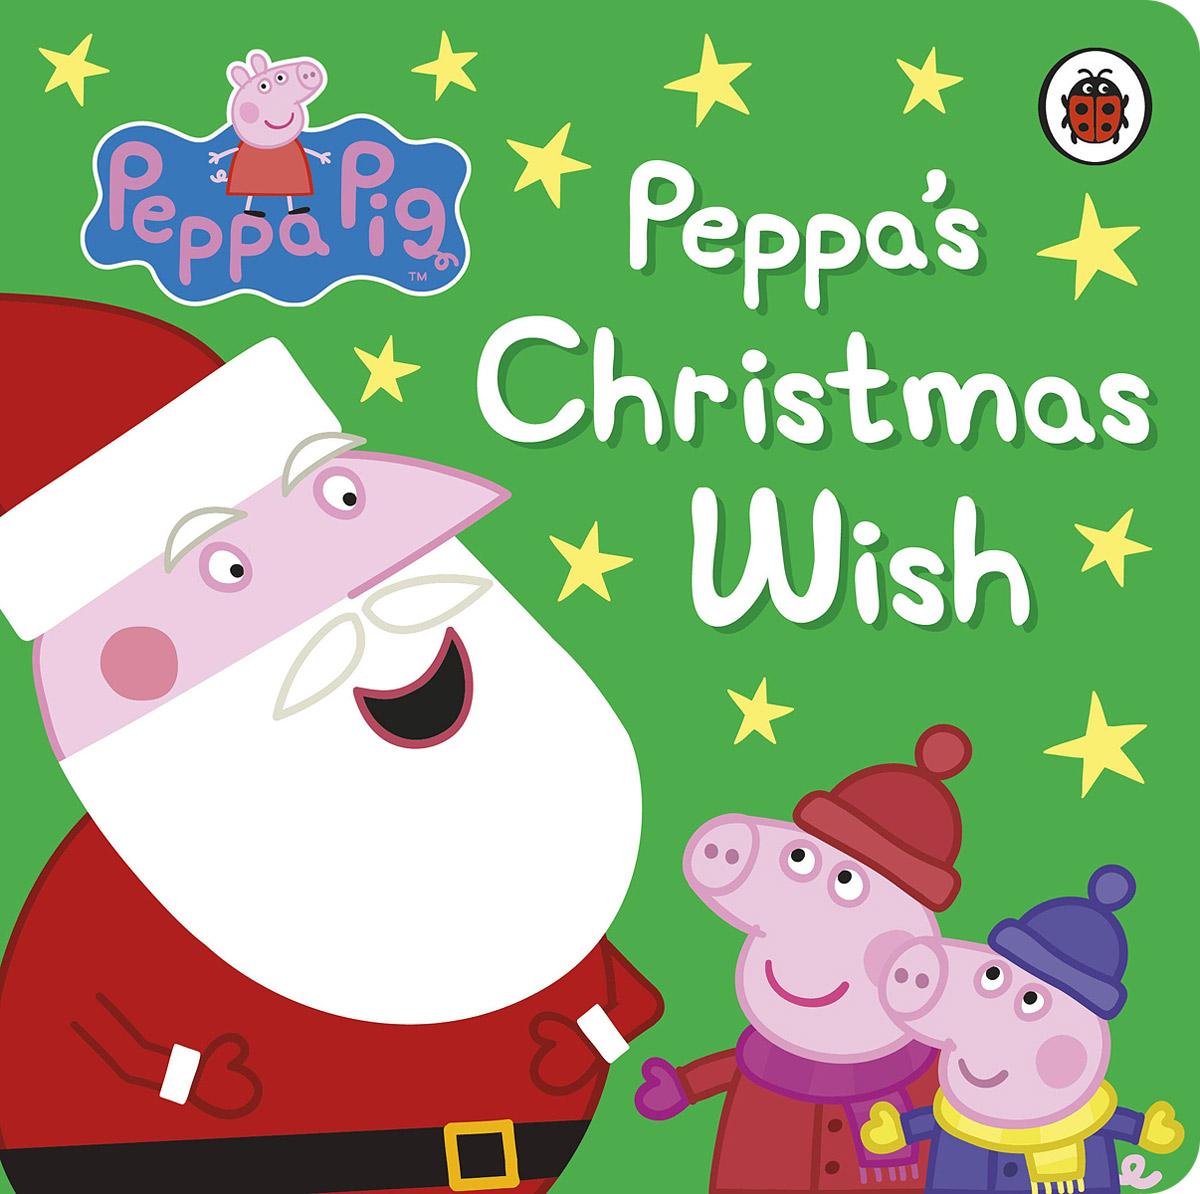 Peppa Pig: Peppa's Christmas Wish  mandy archer peppa pig my granny